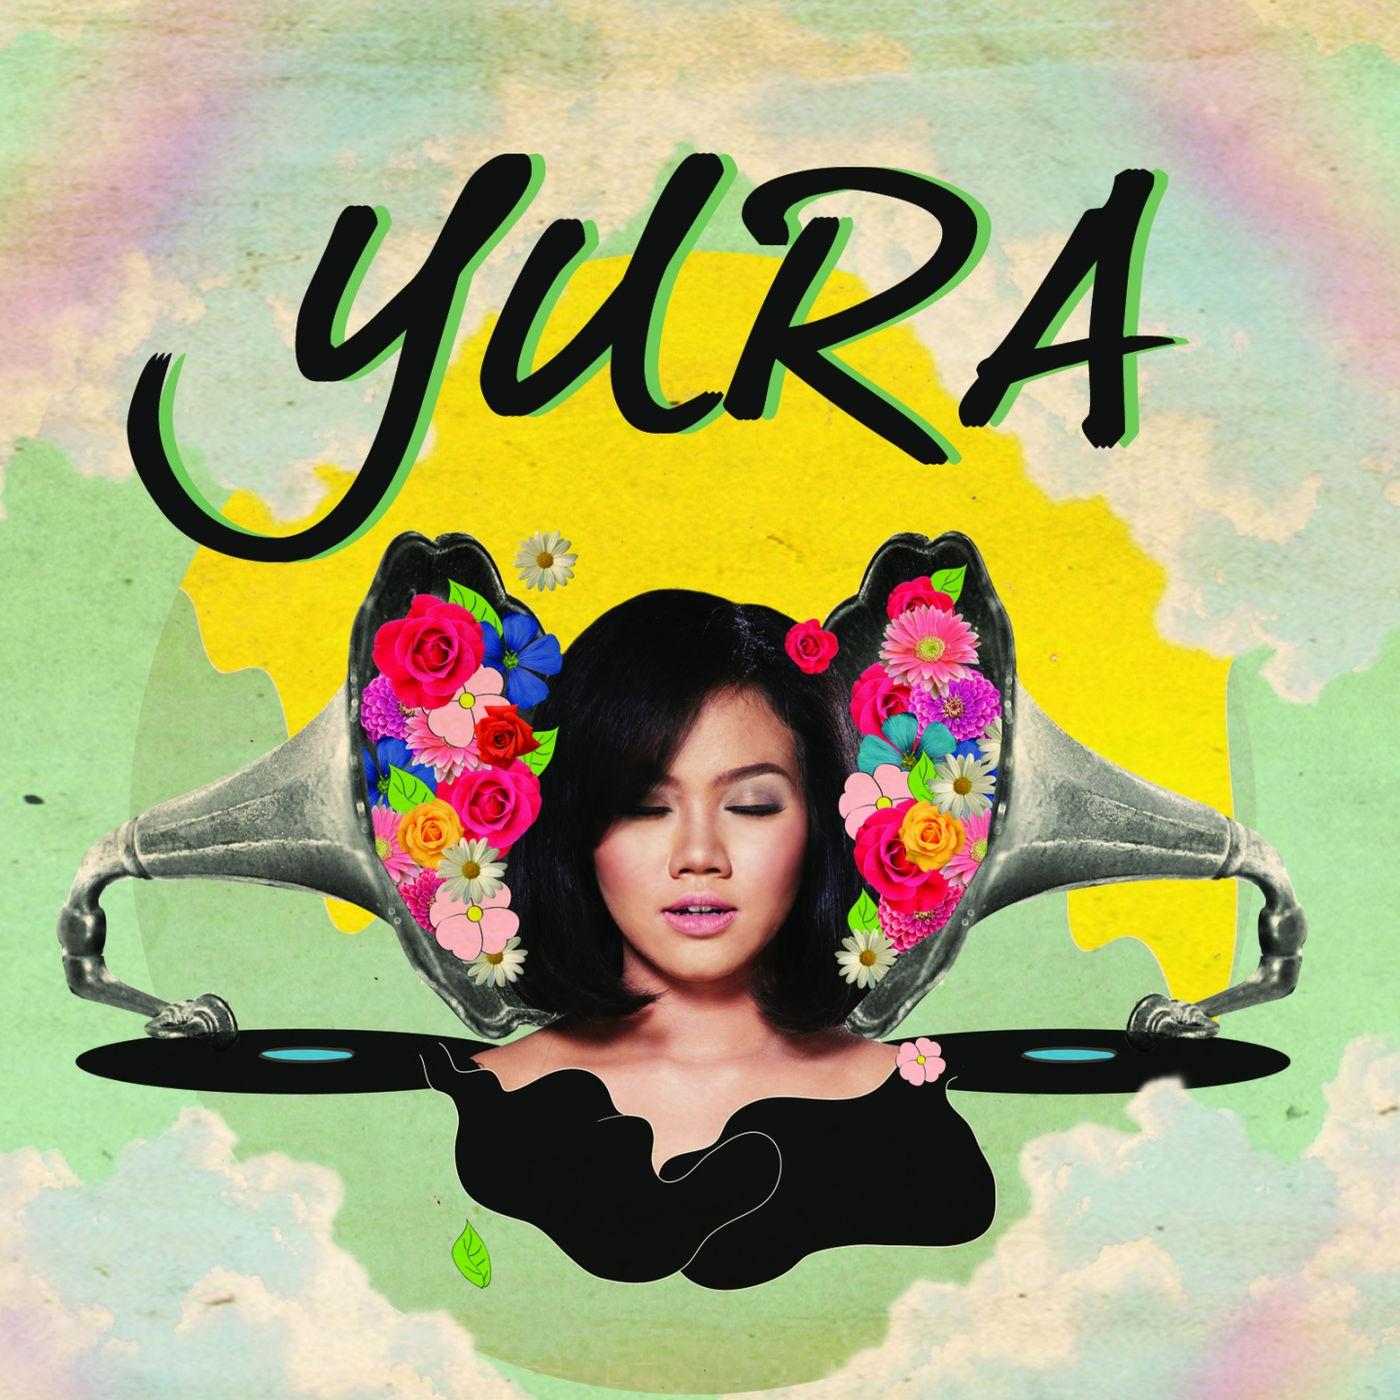 Yura Yunita - Yura - Album (2014) [iTunes Plus AAC M4A]